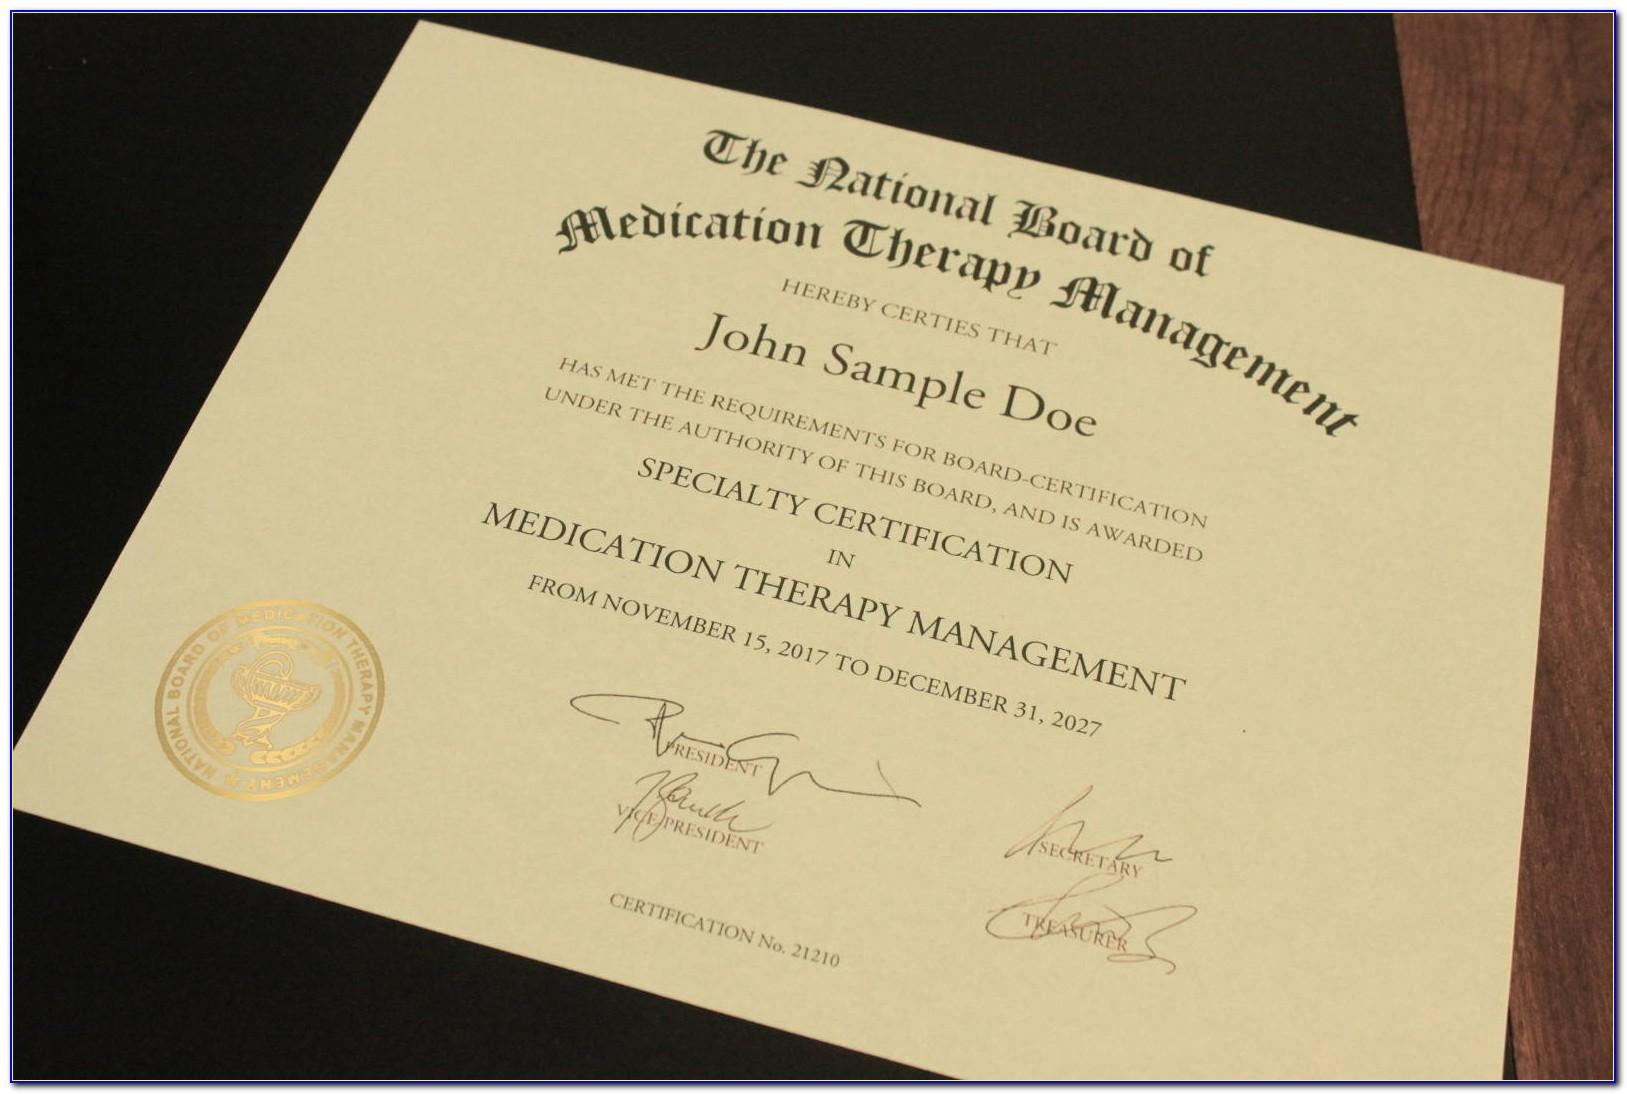 Medication Administration Training Certification